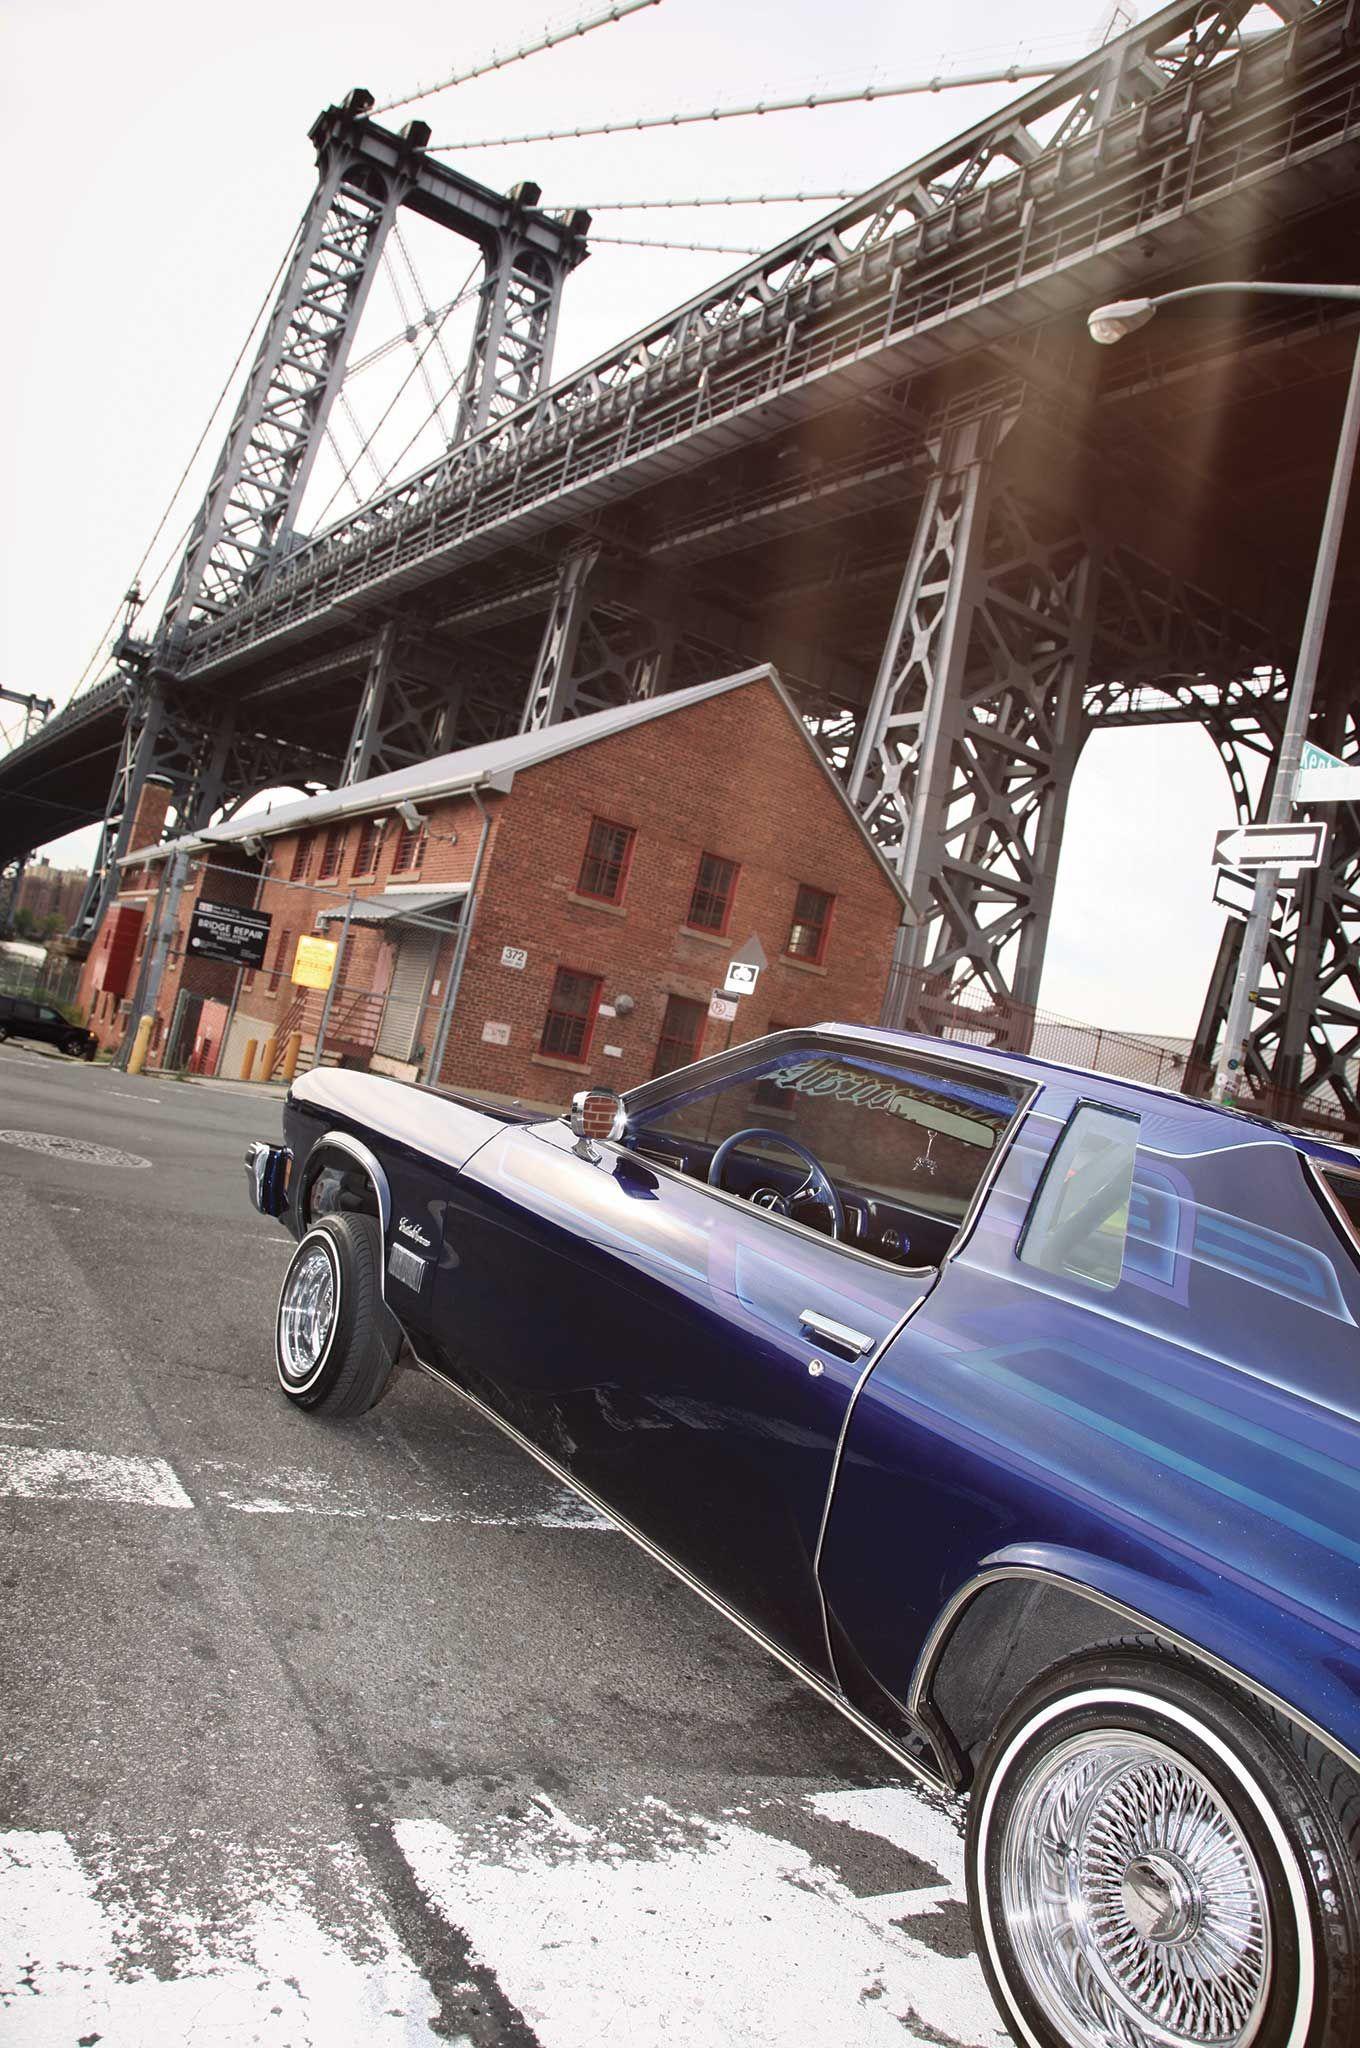 1975 Oldsmobile Cutlass East Coast Cutlass Lowrider Oldsmobile Cutlass Oldsmobile Lowriders